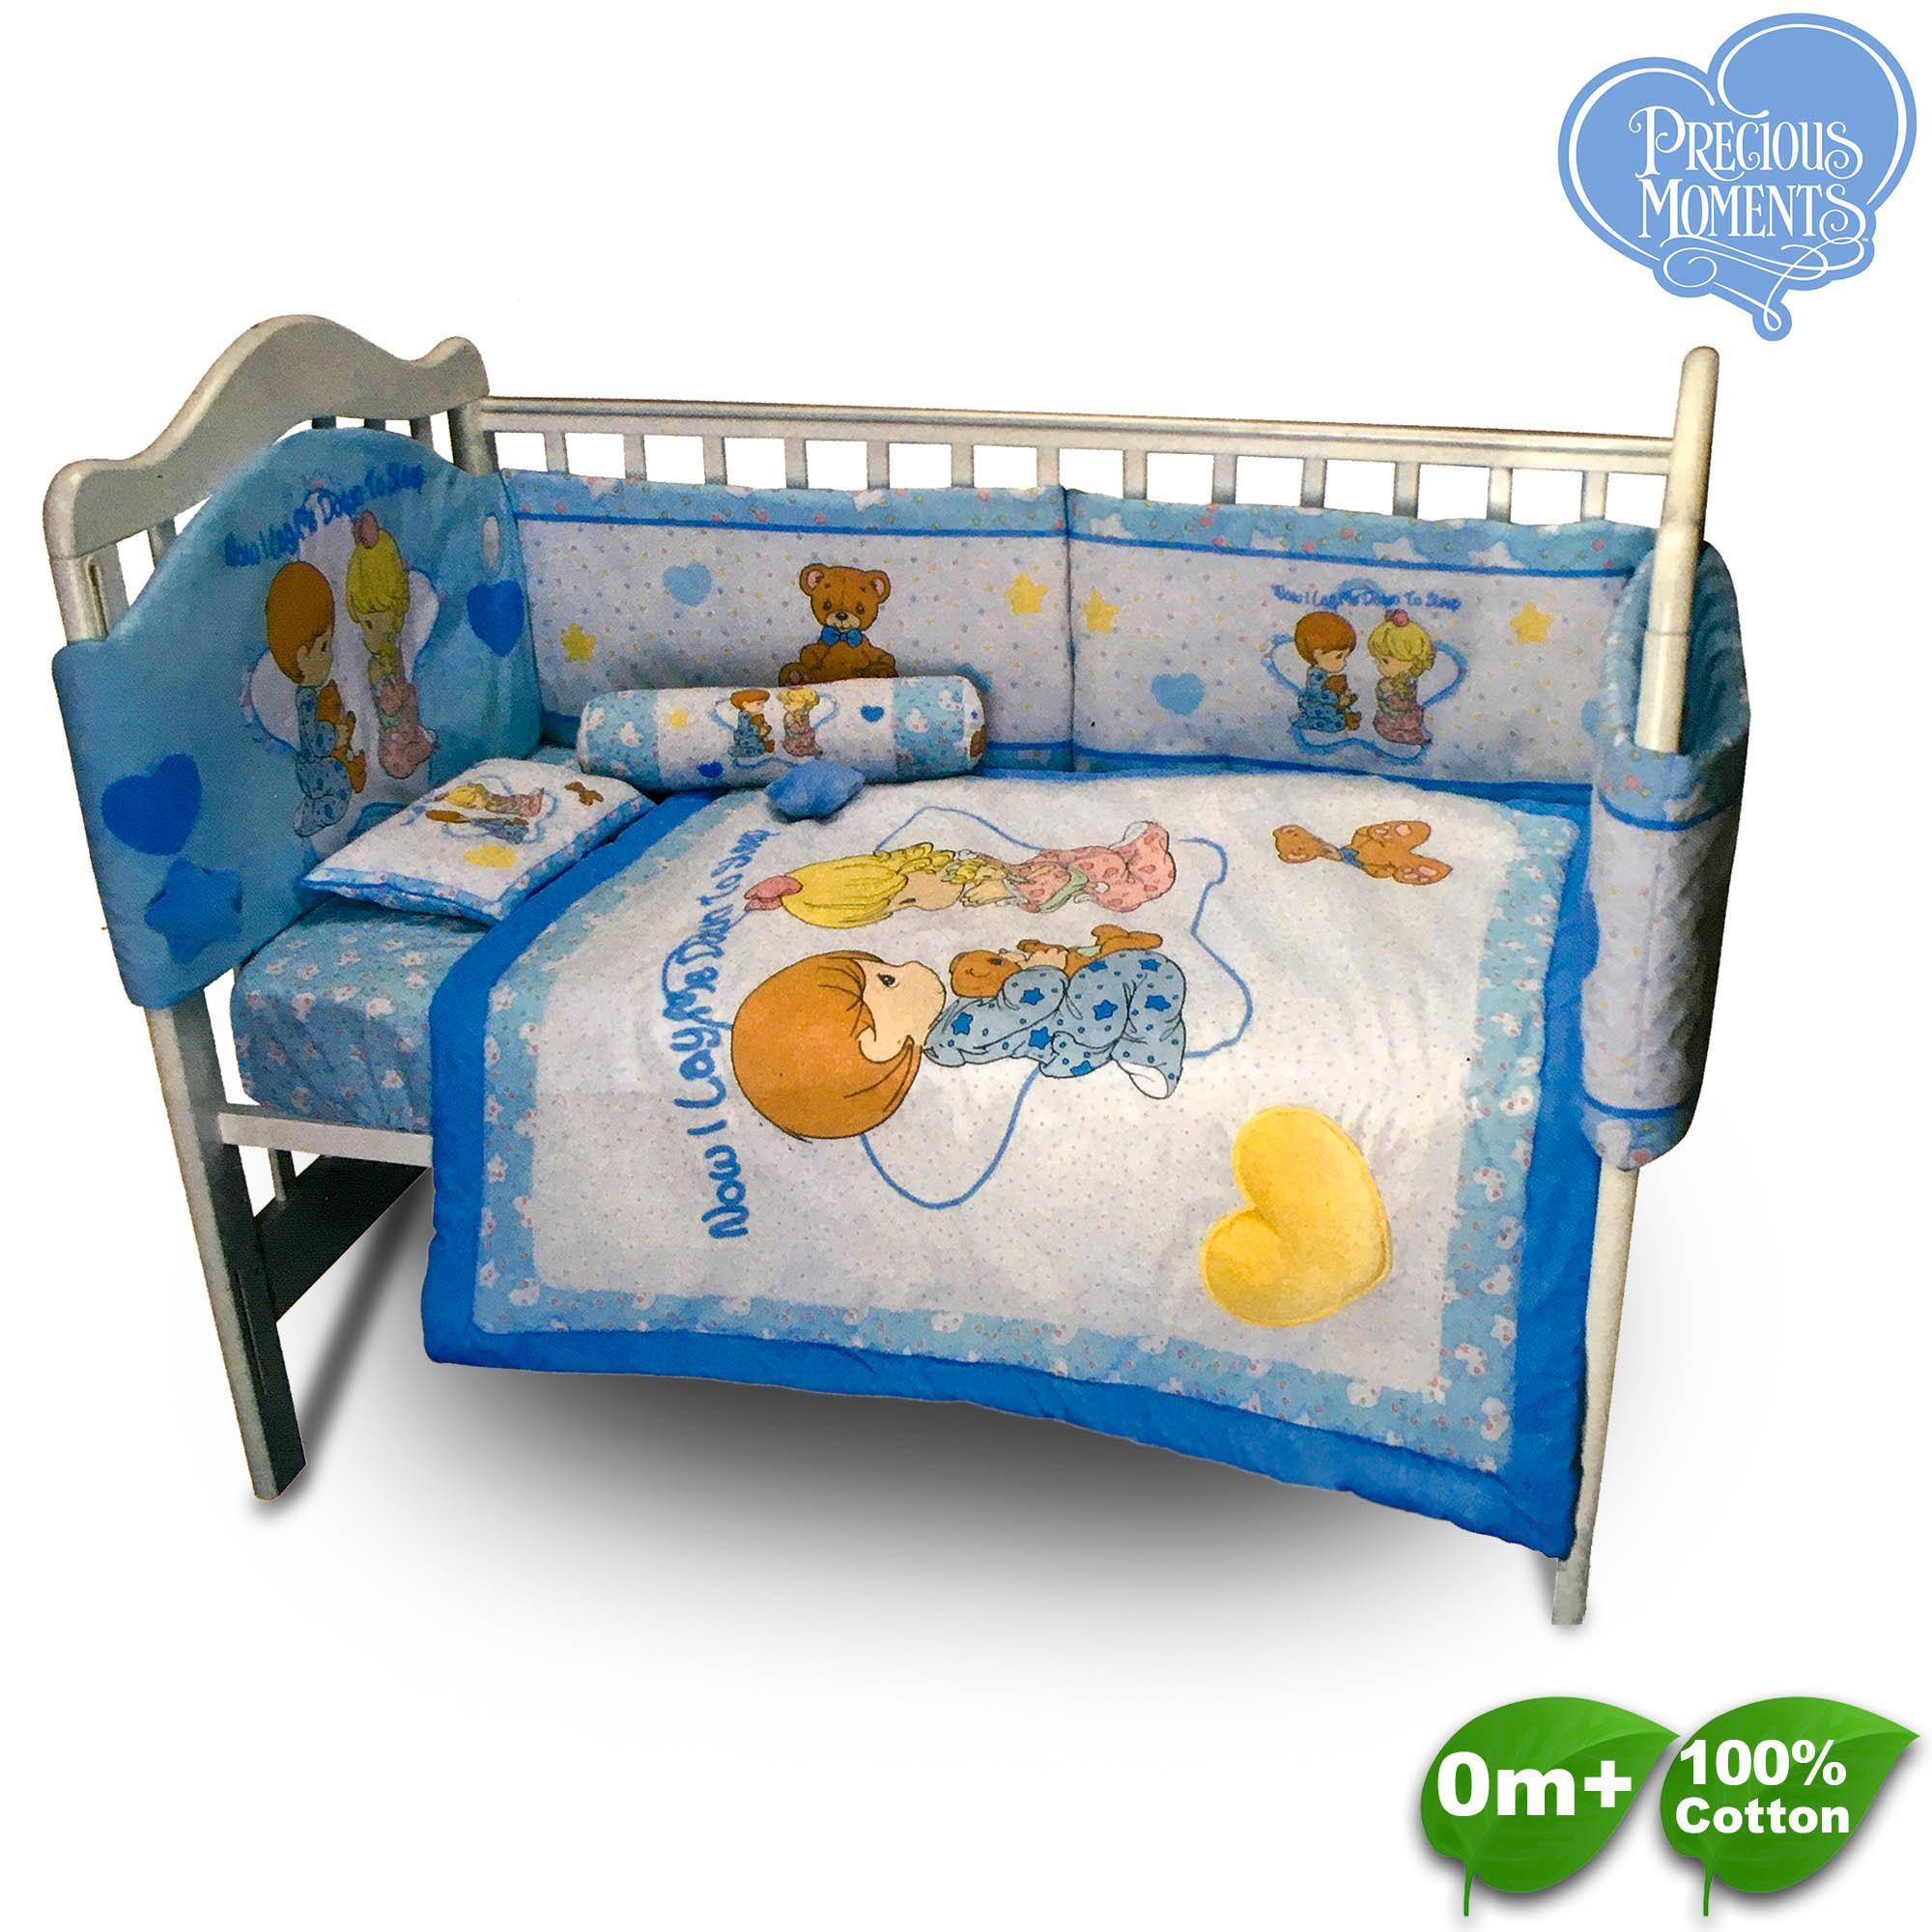 Precious Moments Baby Bedding Set Lazada Ph